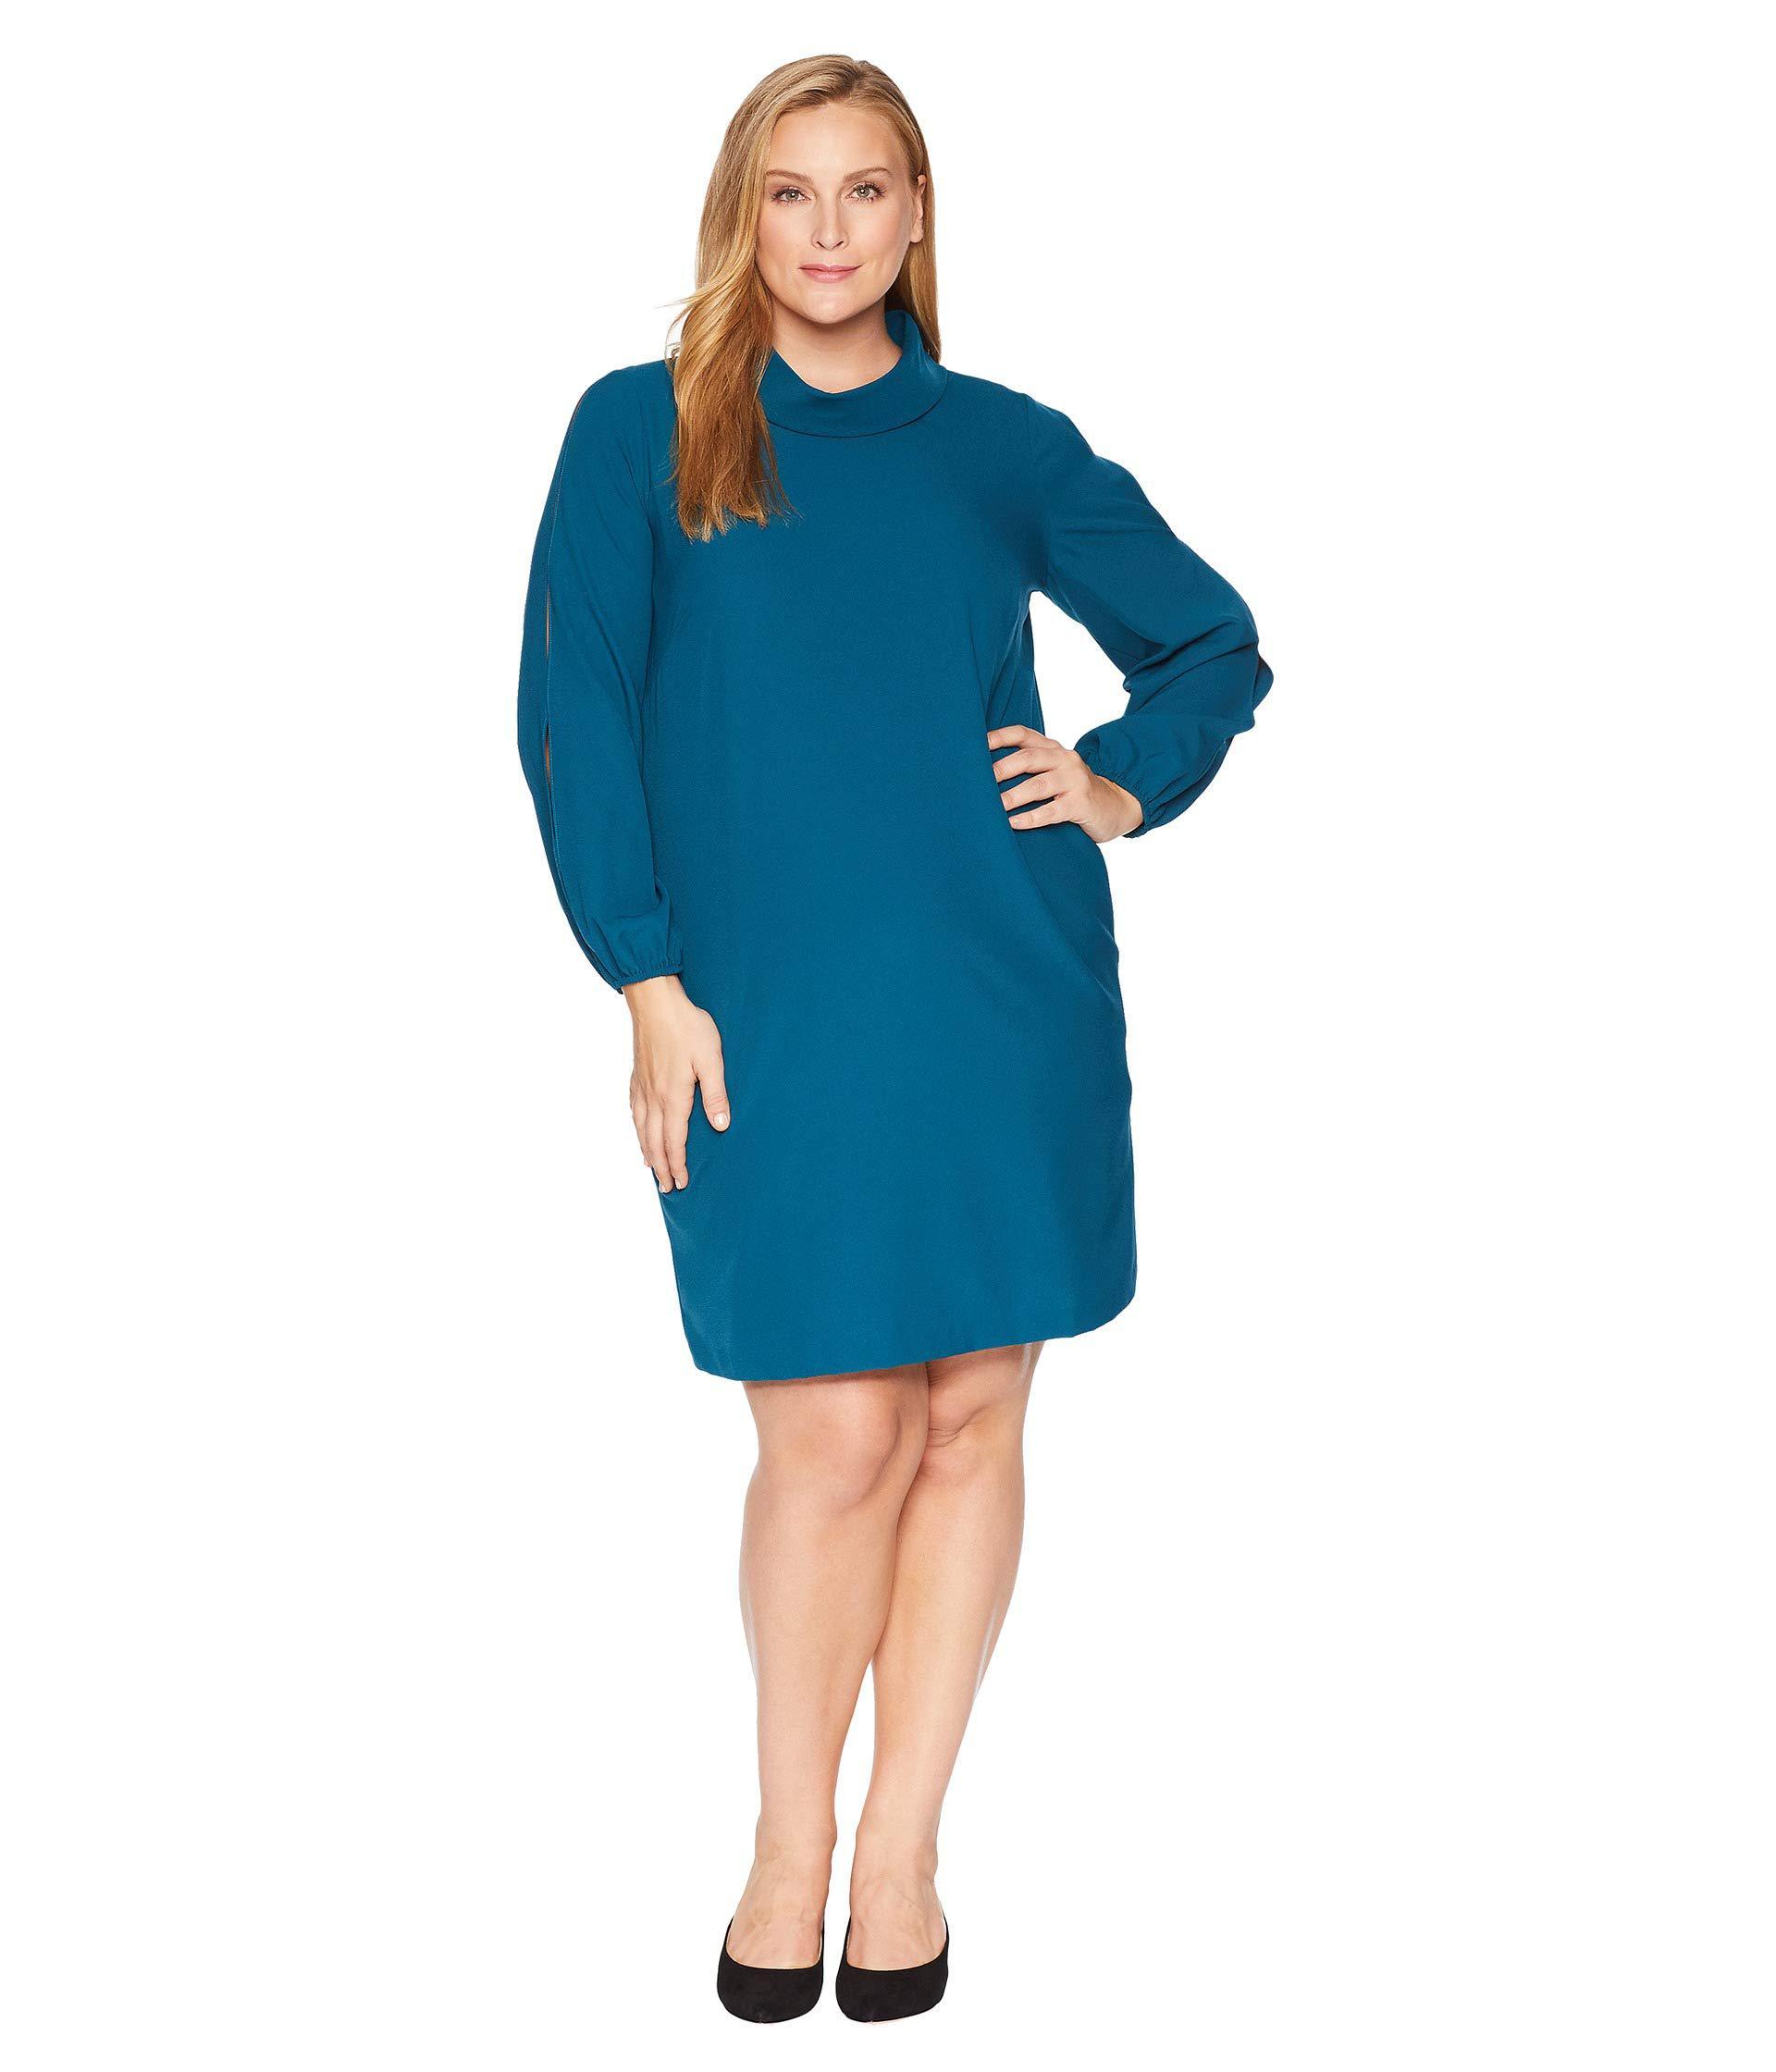 23a9ce44b7175 Tahari. Women's Blue Plus Size Long Split Sleeve Crepe Shift With Roll  Neckline